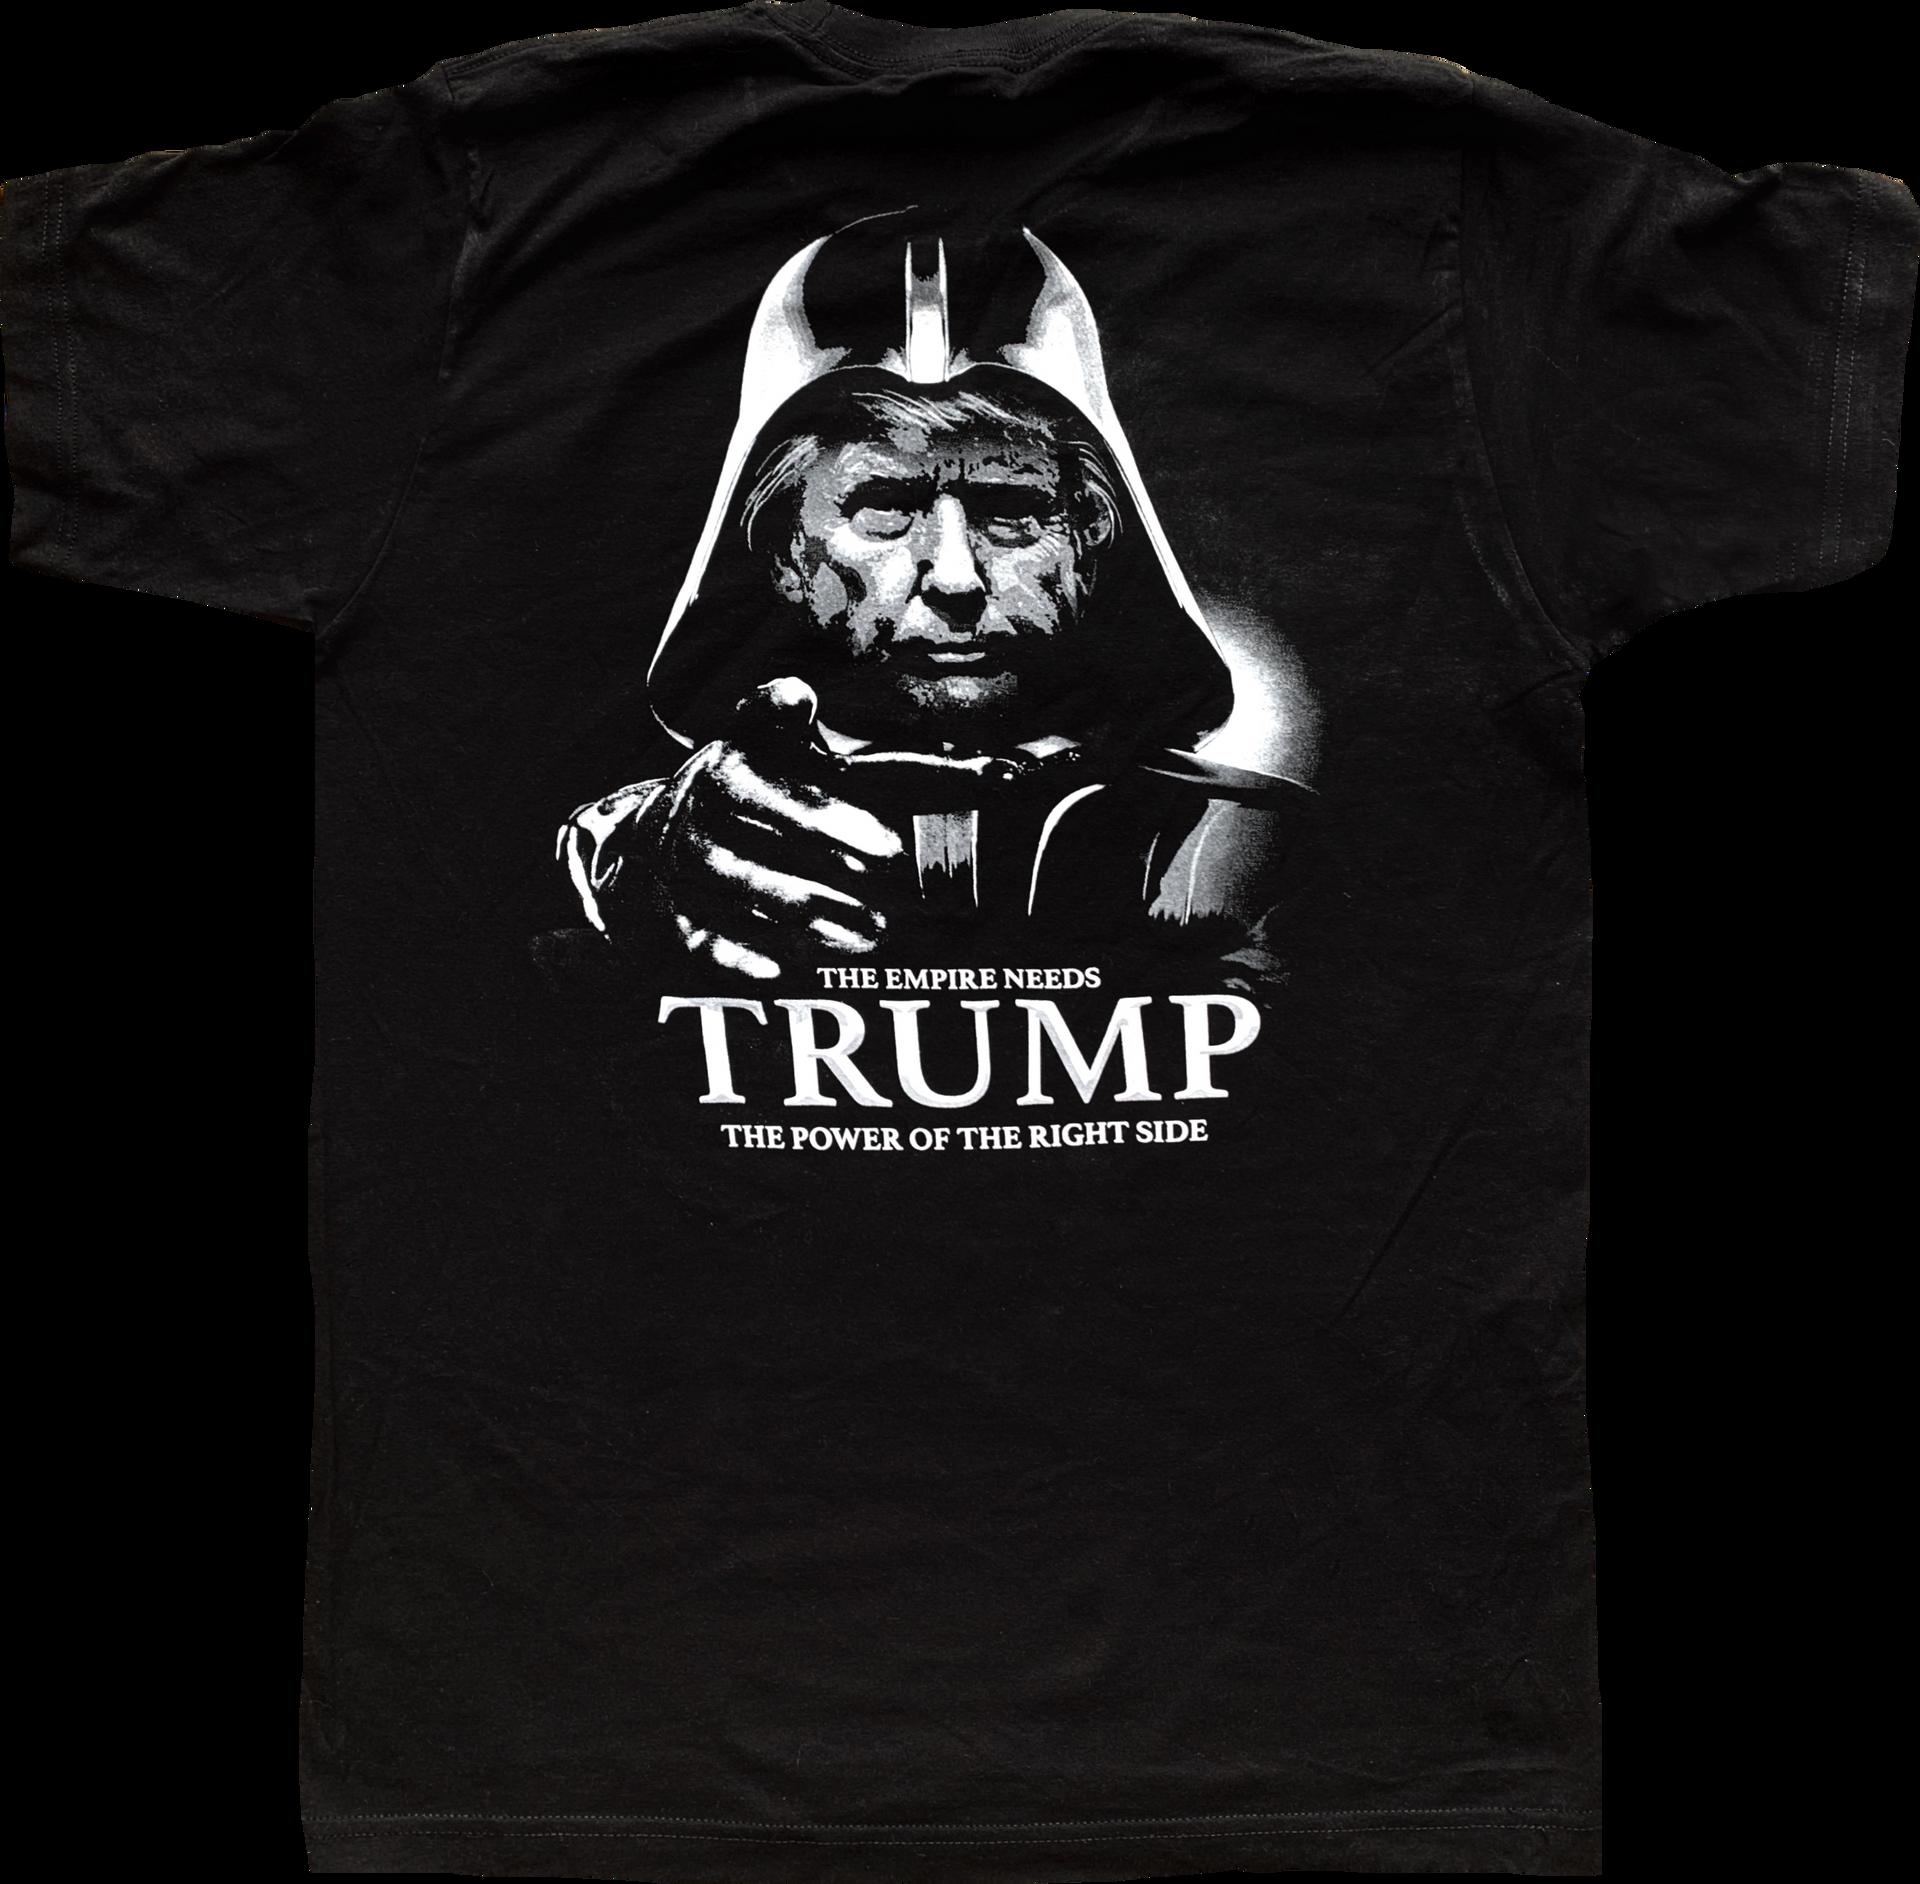 Trump as Darth Vader